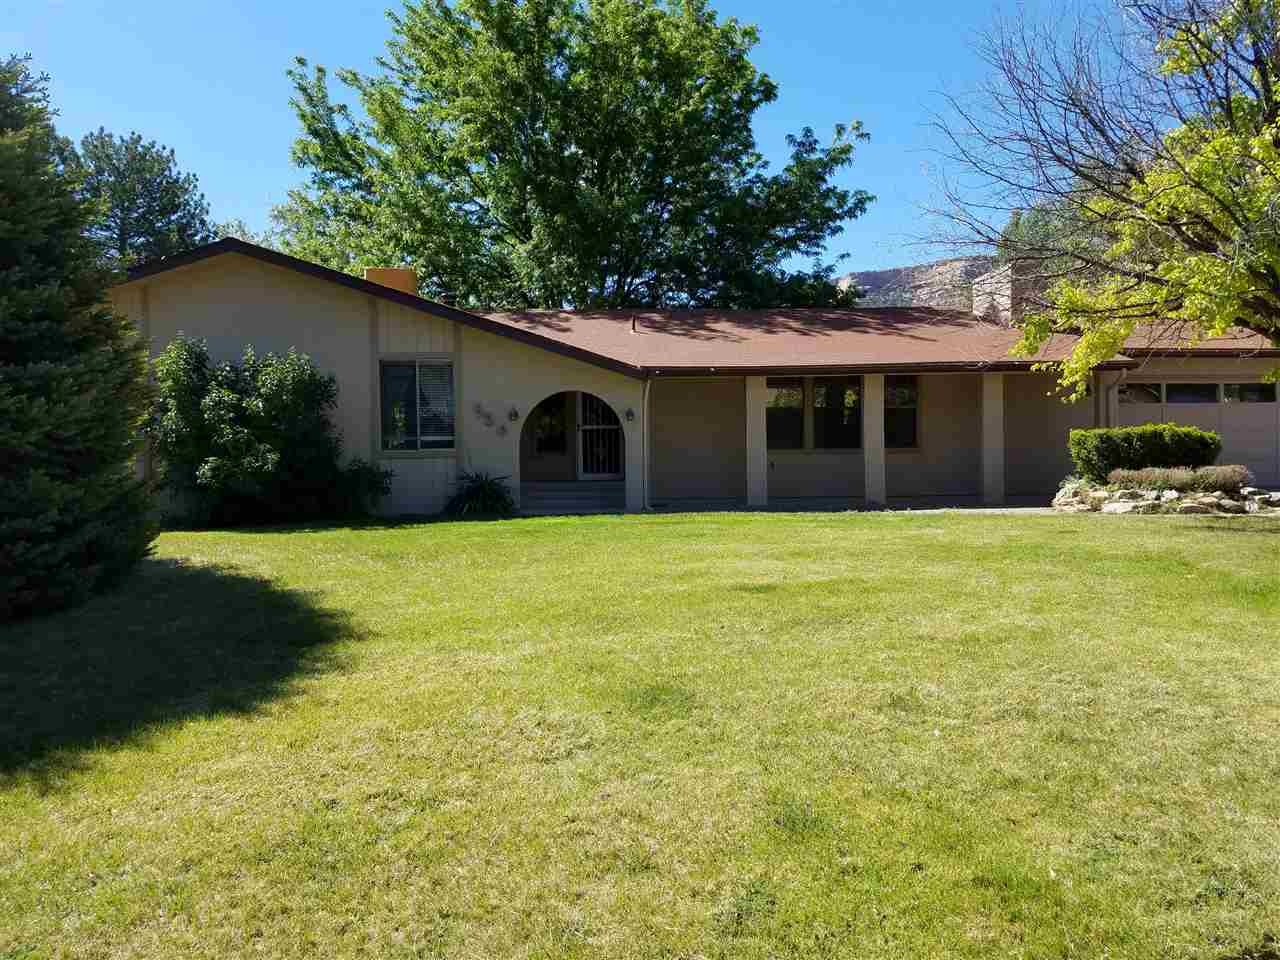 520 Tiara Drive, Grand Junction, CO 81507